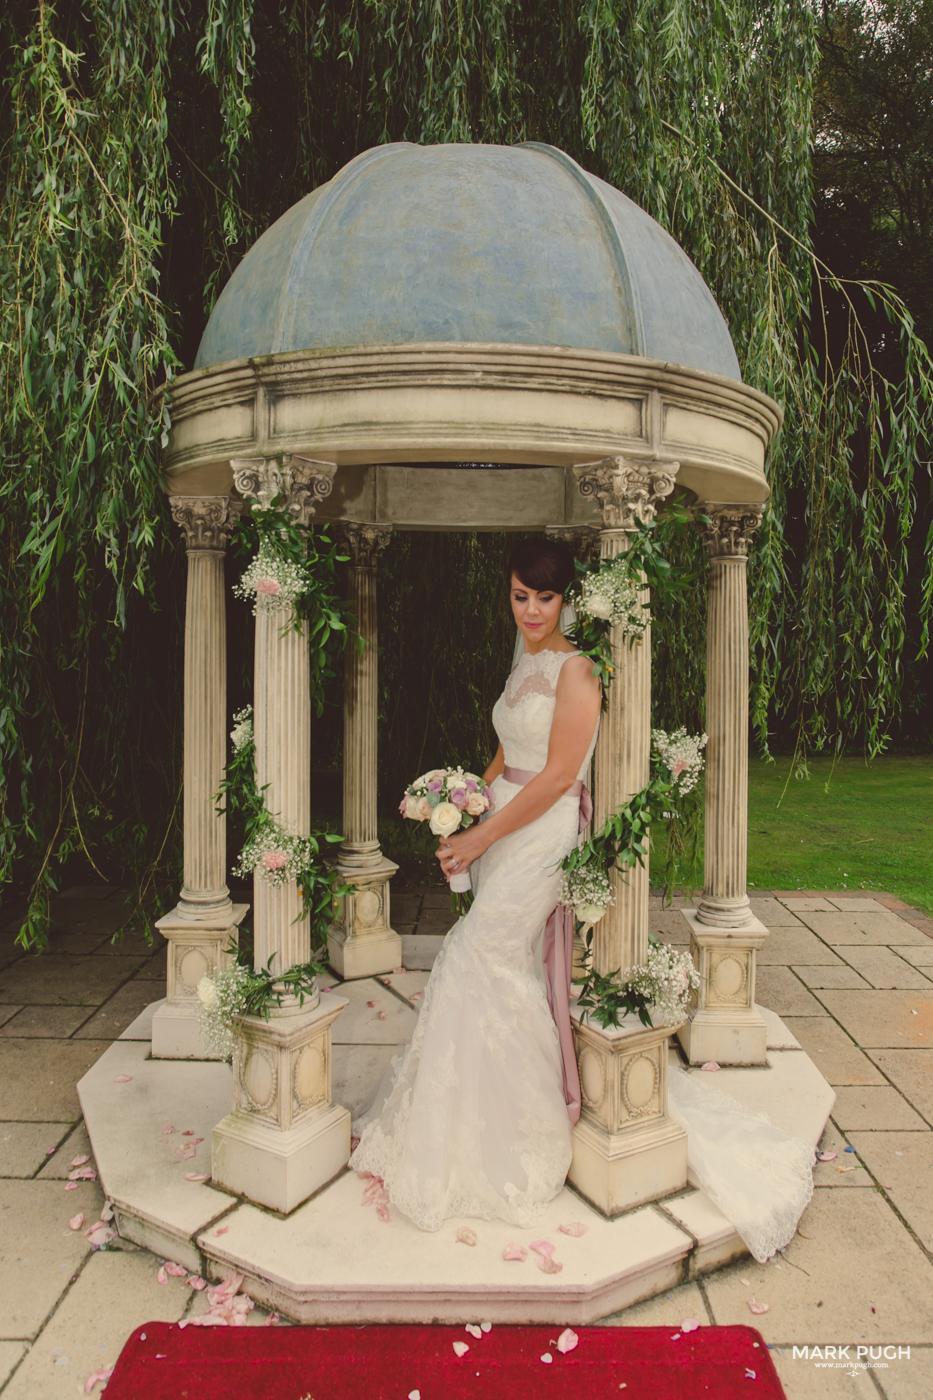 116 - Wedding Photography at The Dower House Hotel Manor Estate Woodhall Spa Lincolnshire LN10 6PY by Mark Pugh www.mpmedia.co.uk www.markpugh.com.jpg